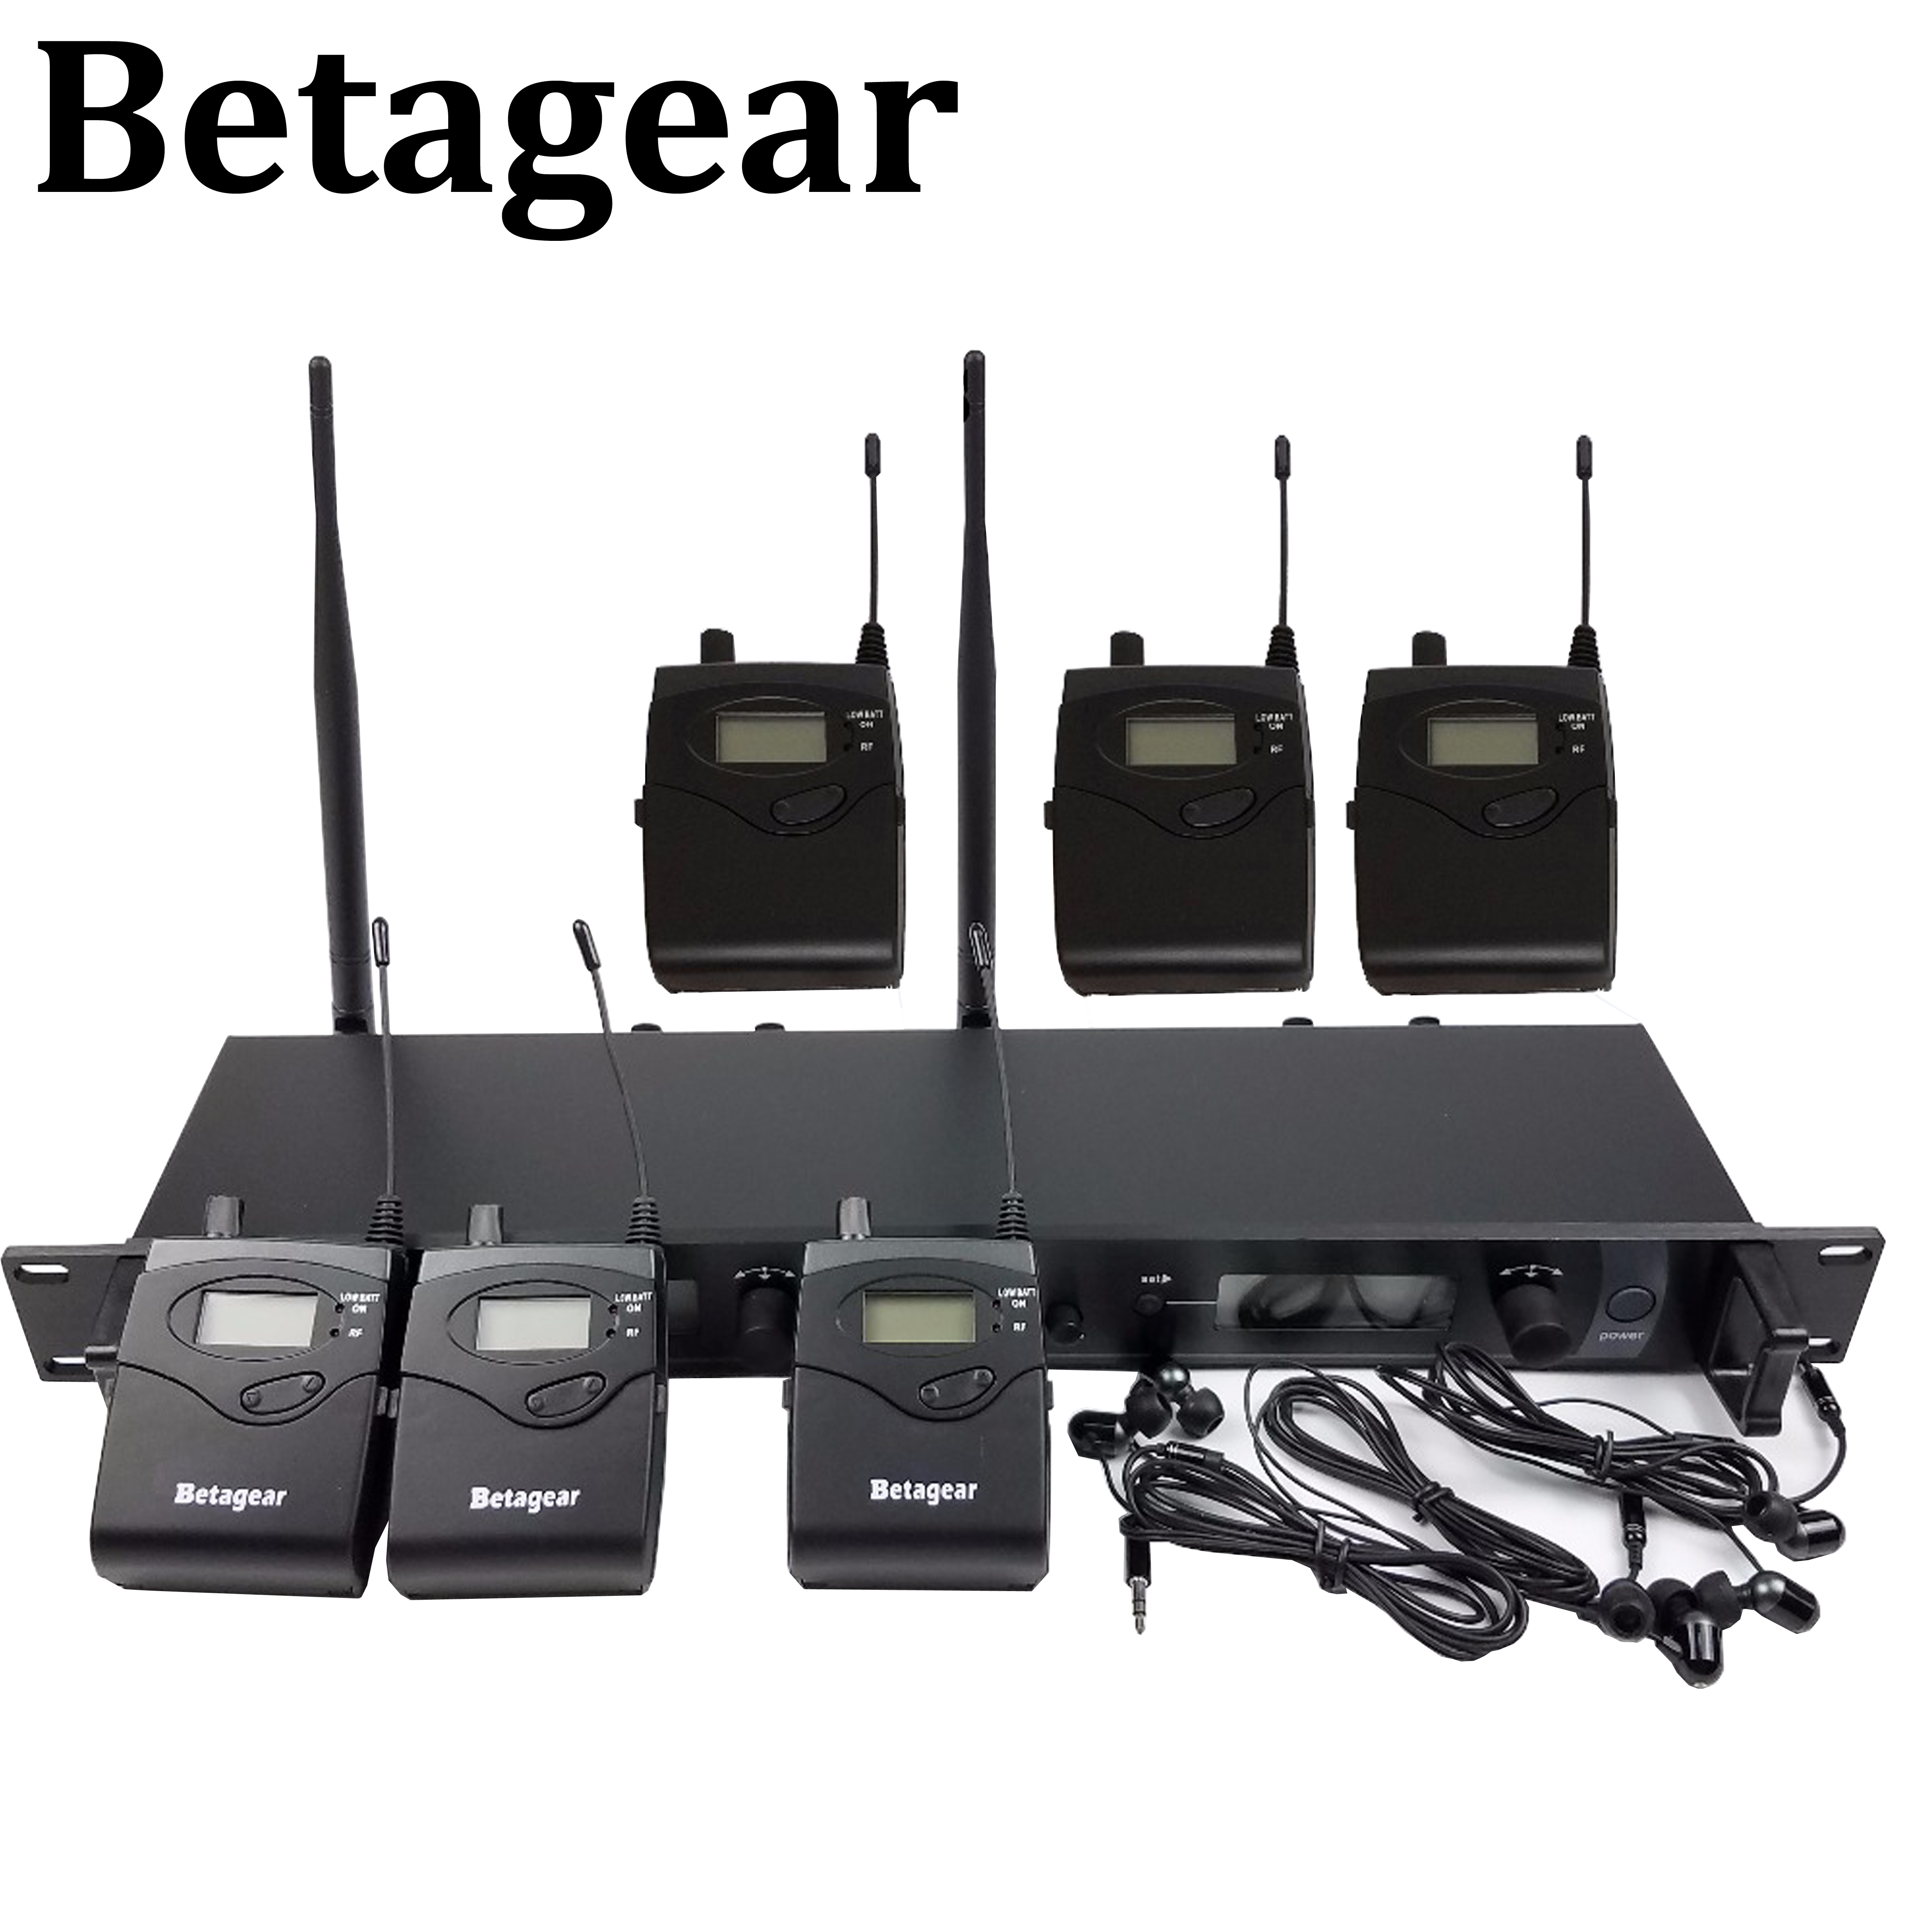 Betagear SR2050 IEM 6 Empfänger in ohr monitor system bühne überwachung system studio professional audio sound system professional